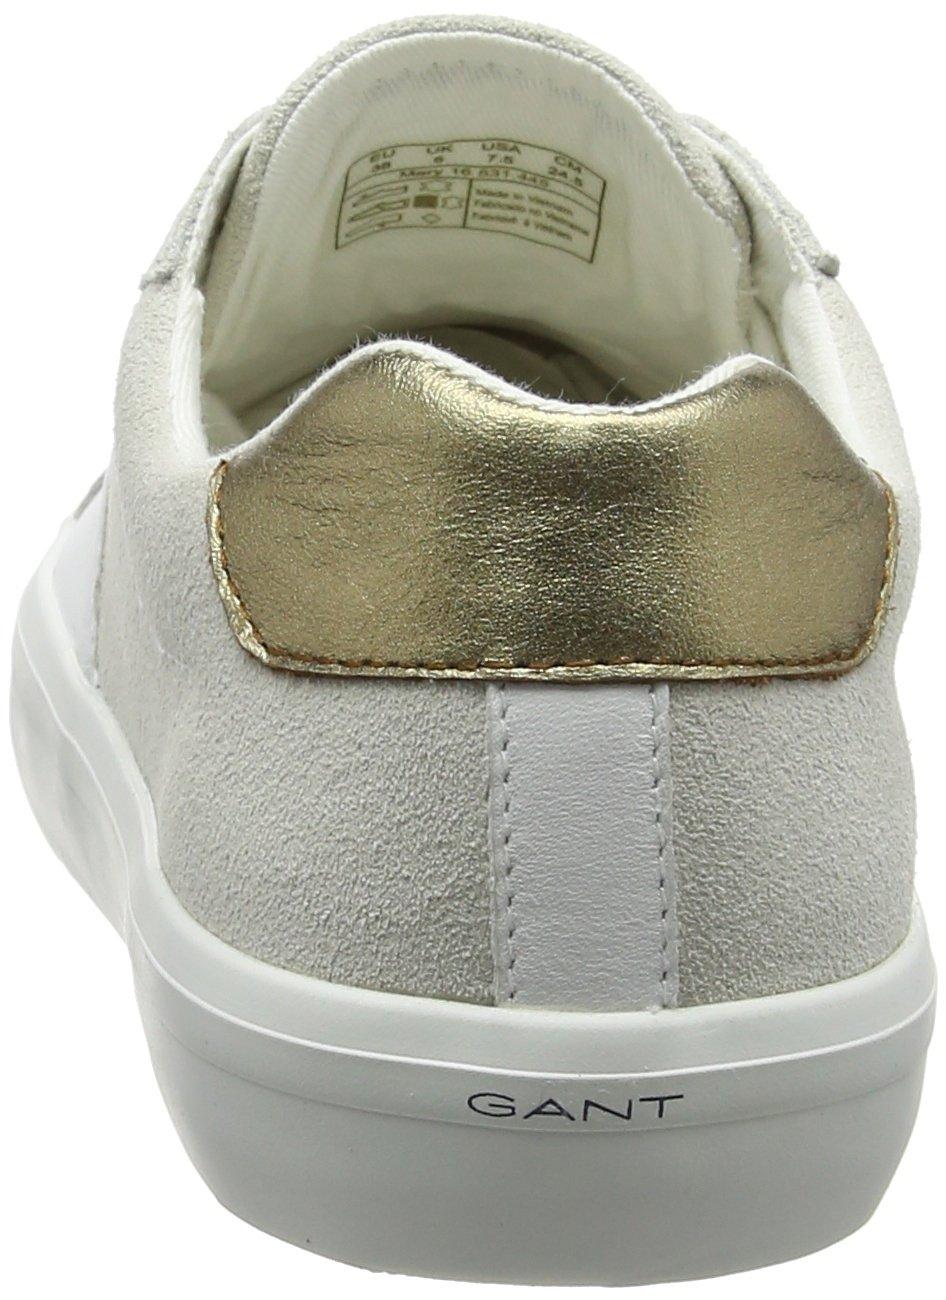 GANT Damen Mary Sneaker Mehrfarbig Wht./Cream) (Bright Wht./Cream) Mehrfarbig 1cfe4a